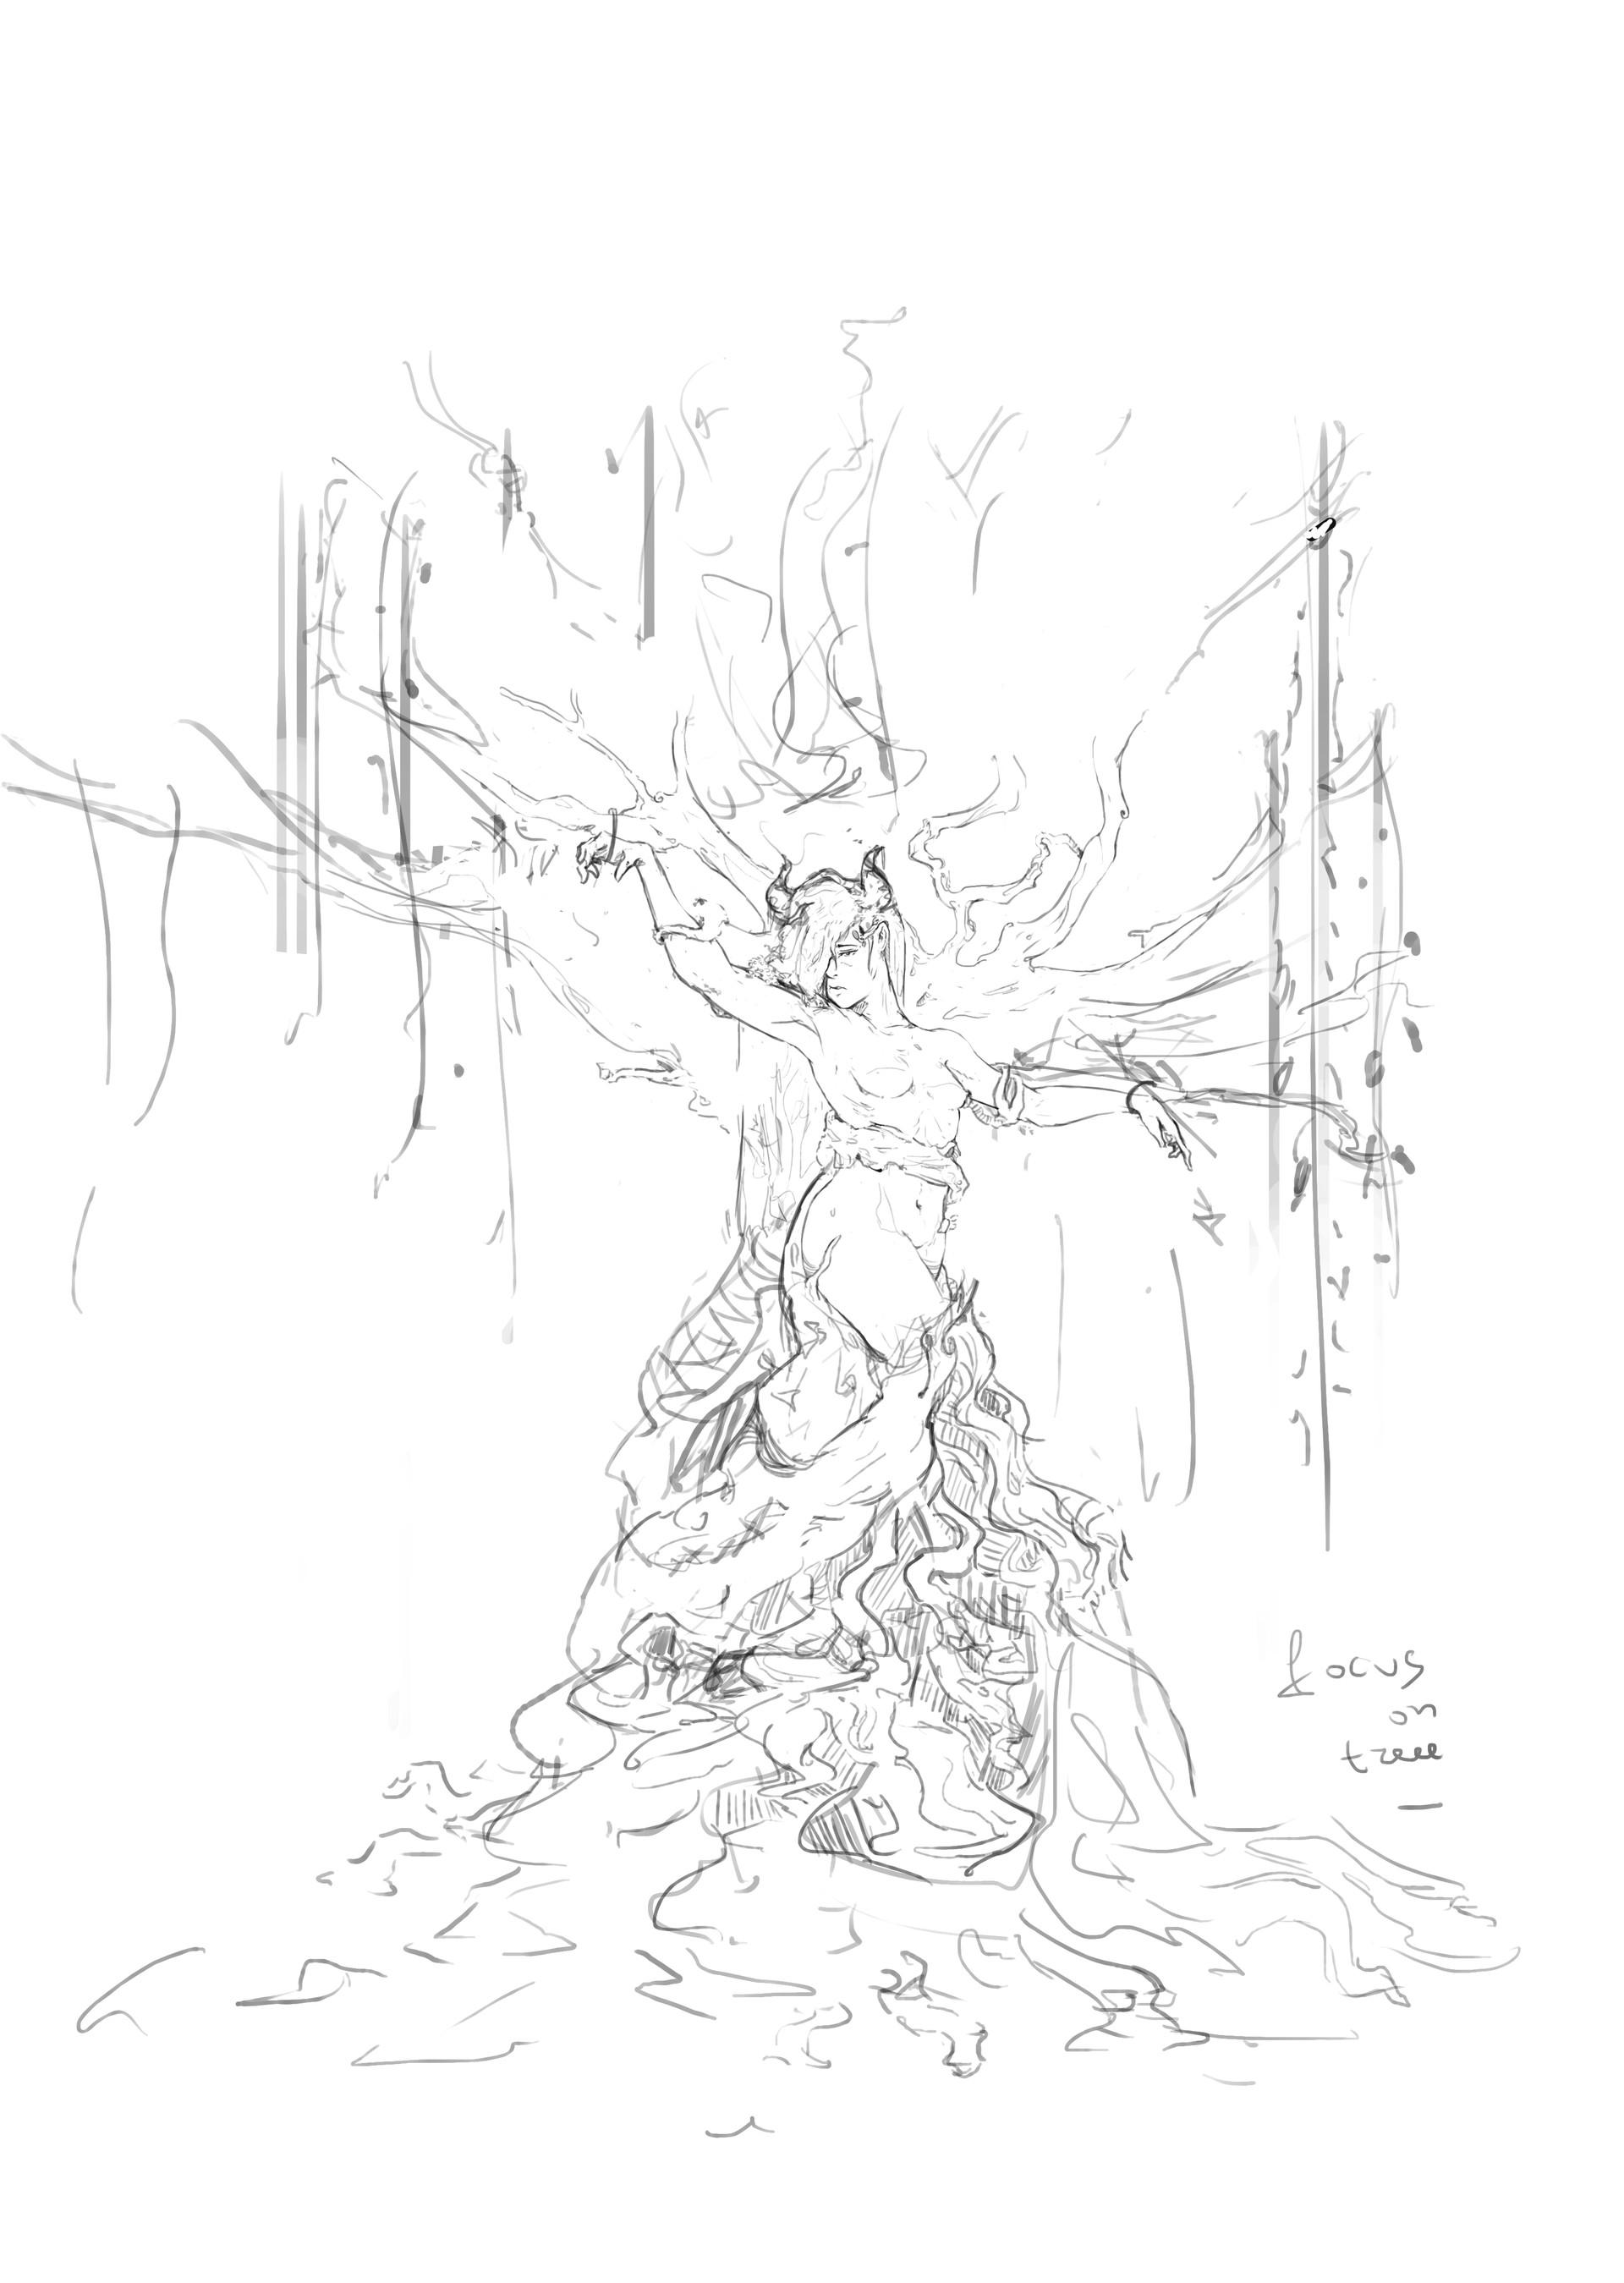 Boyan kazalov treegirlsketch